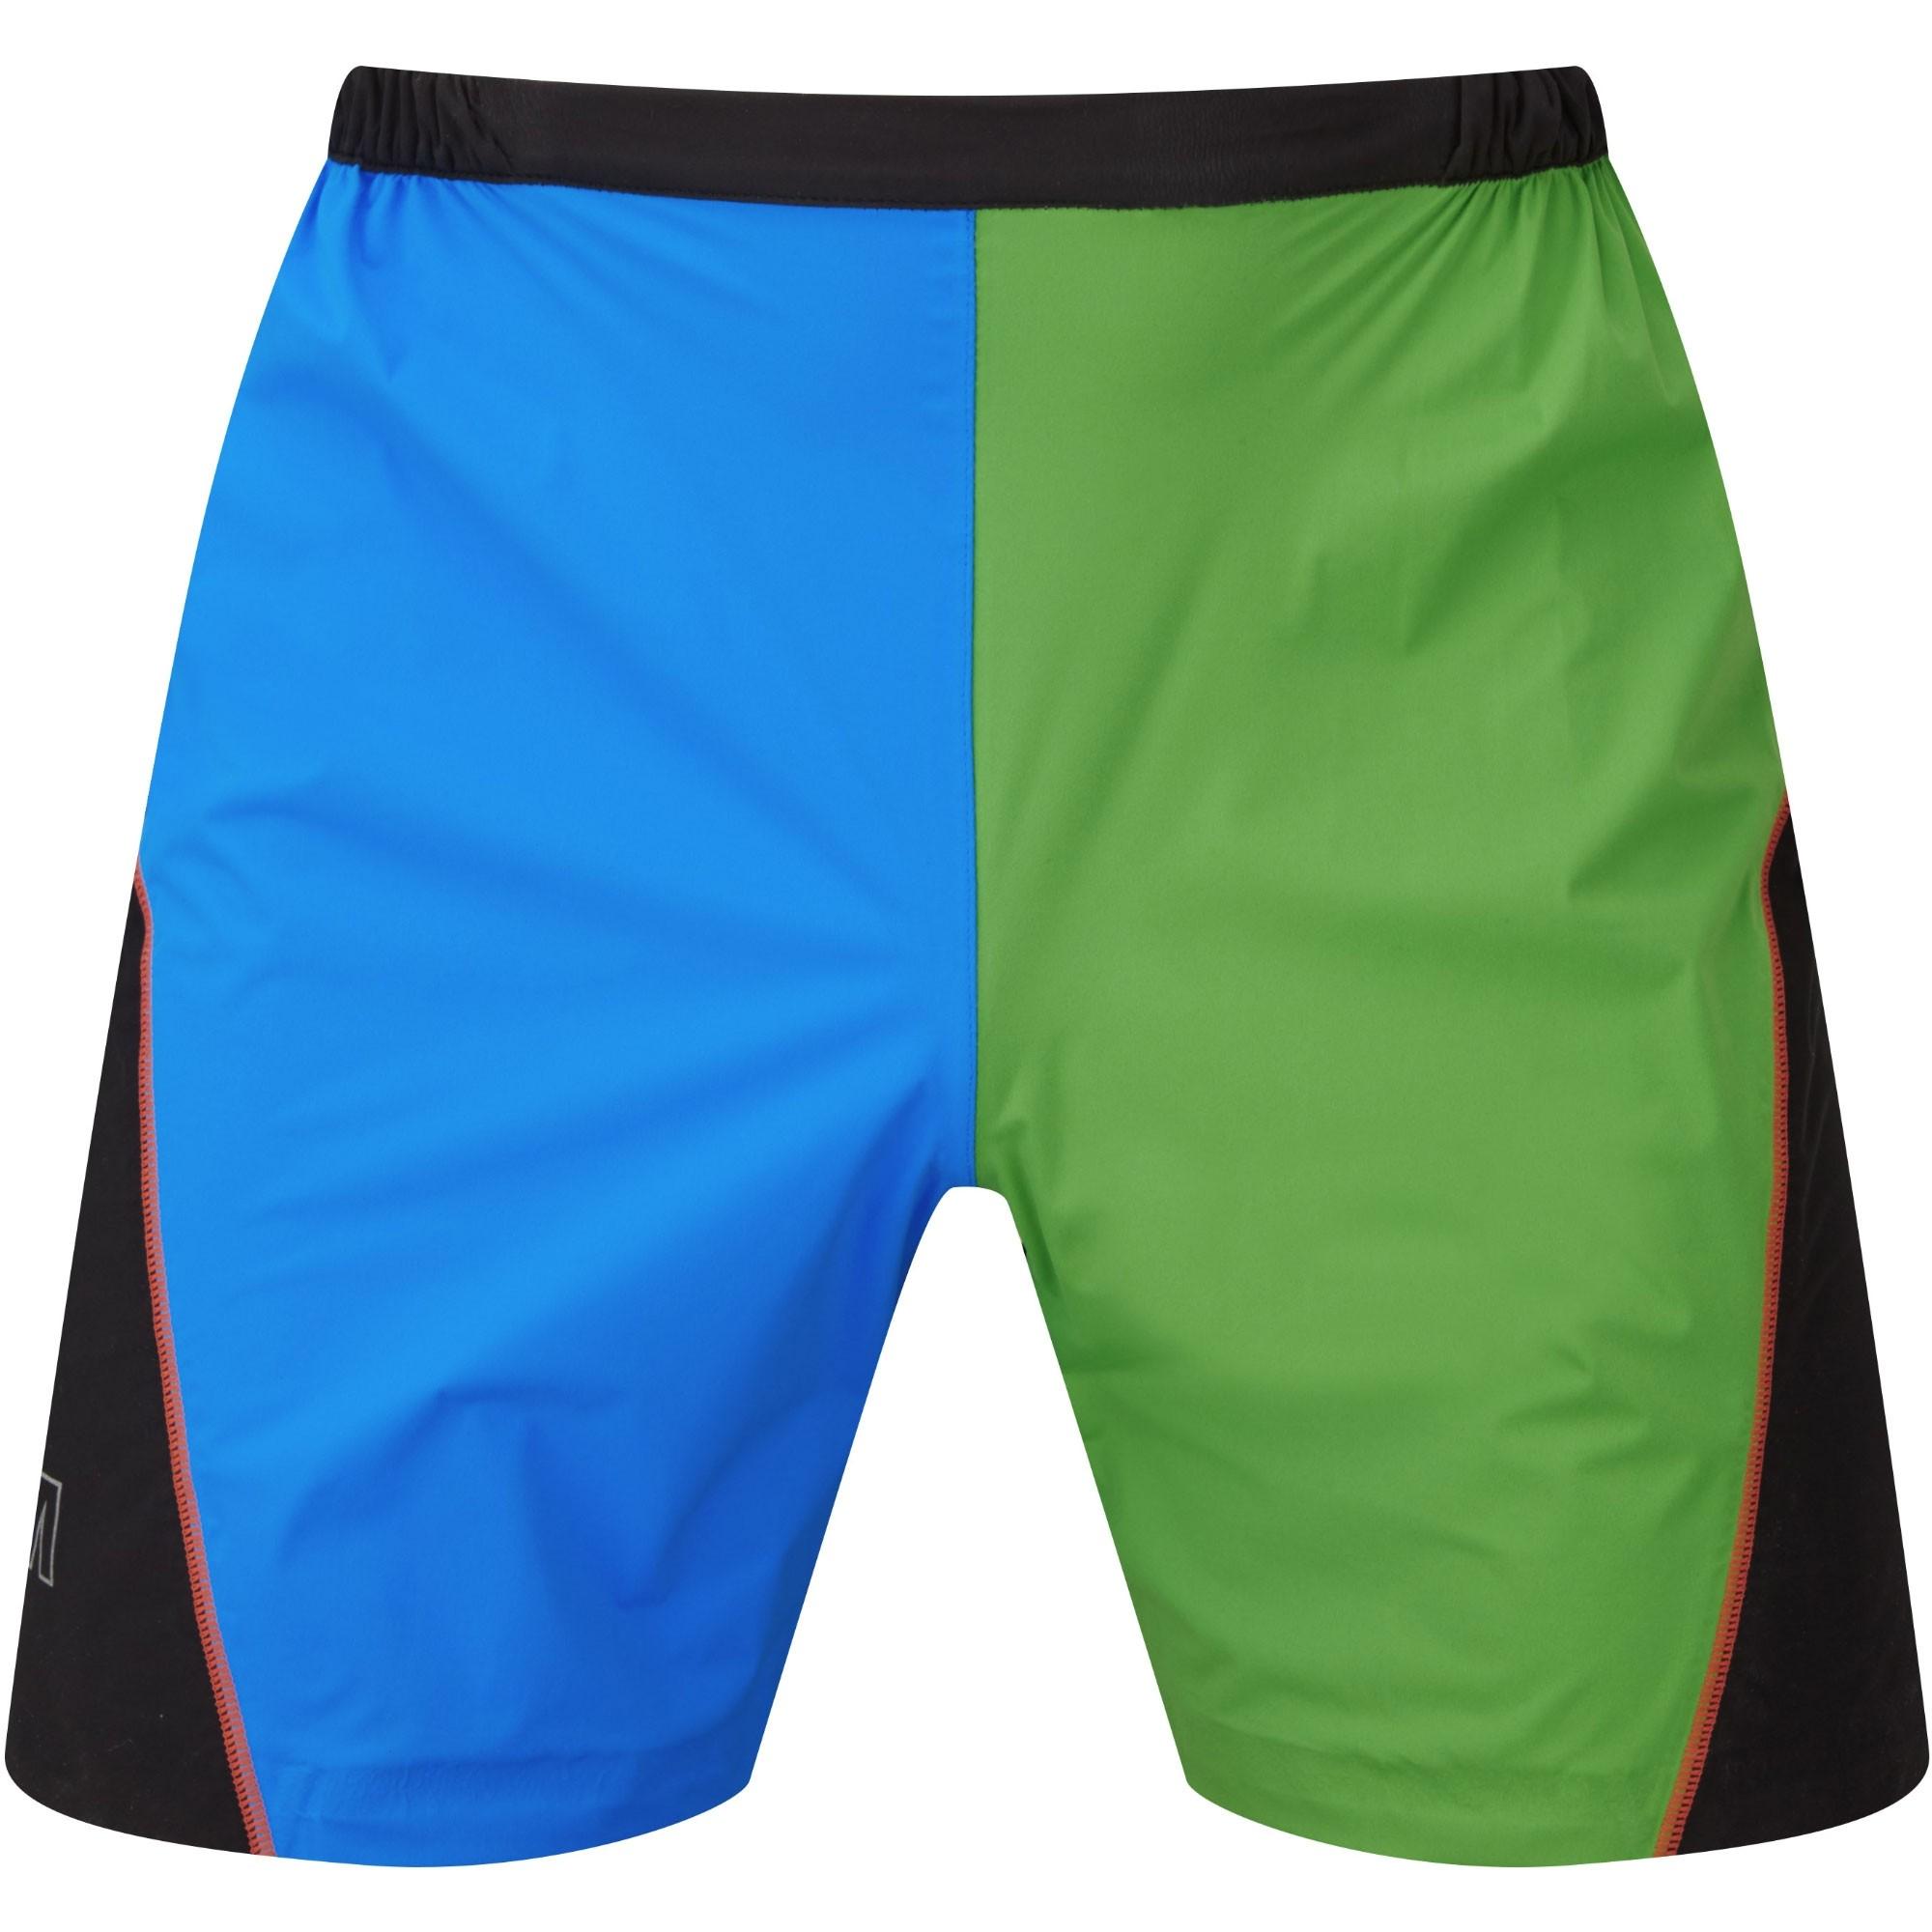 OMM Kamleika Waterproof Running Shorts - Front